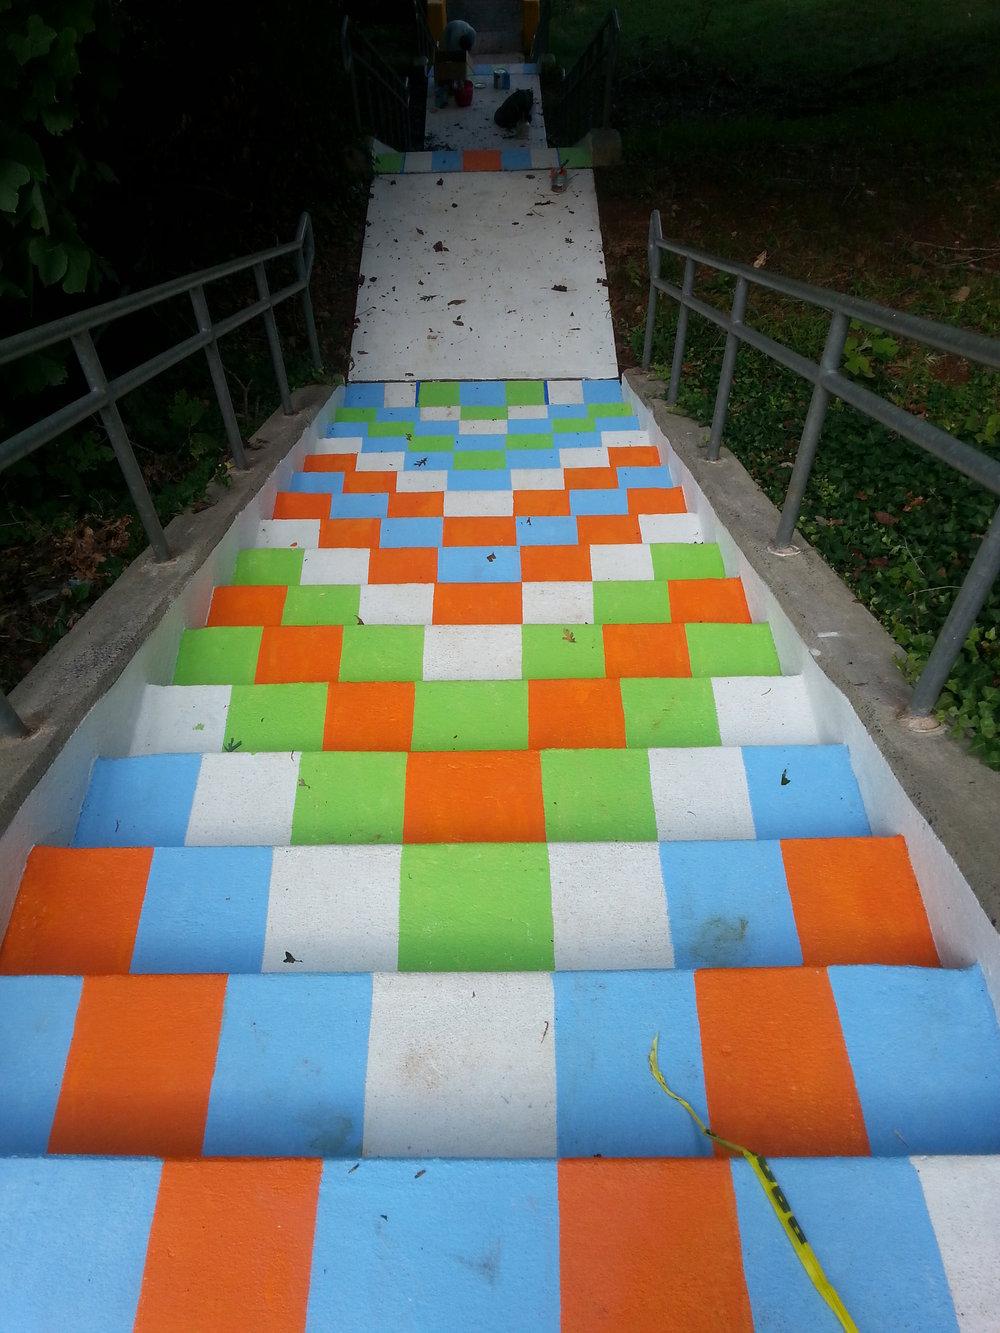 Stairs-Anita-Stroud-park-mural-no-barrers-project-2016-julio-gonzalez-art-stair-mura.jpg